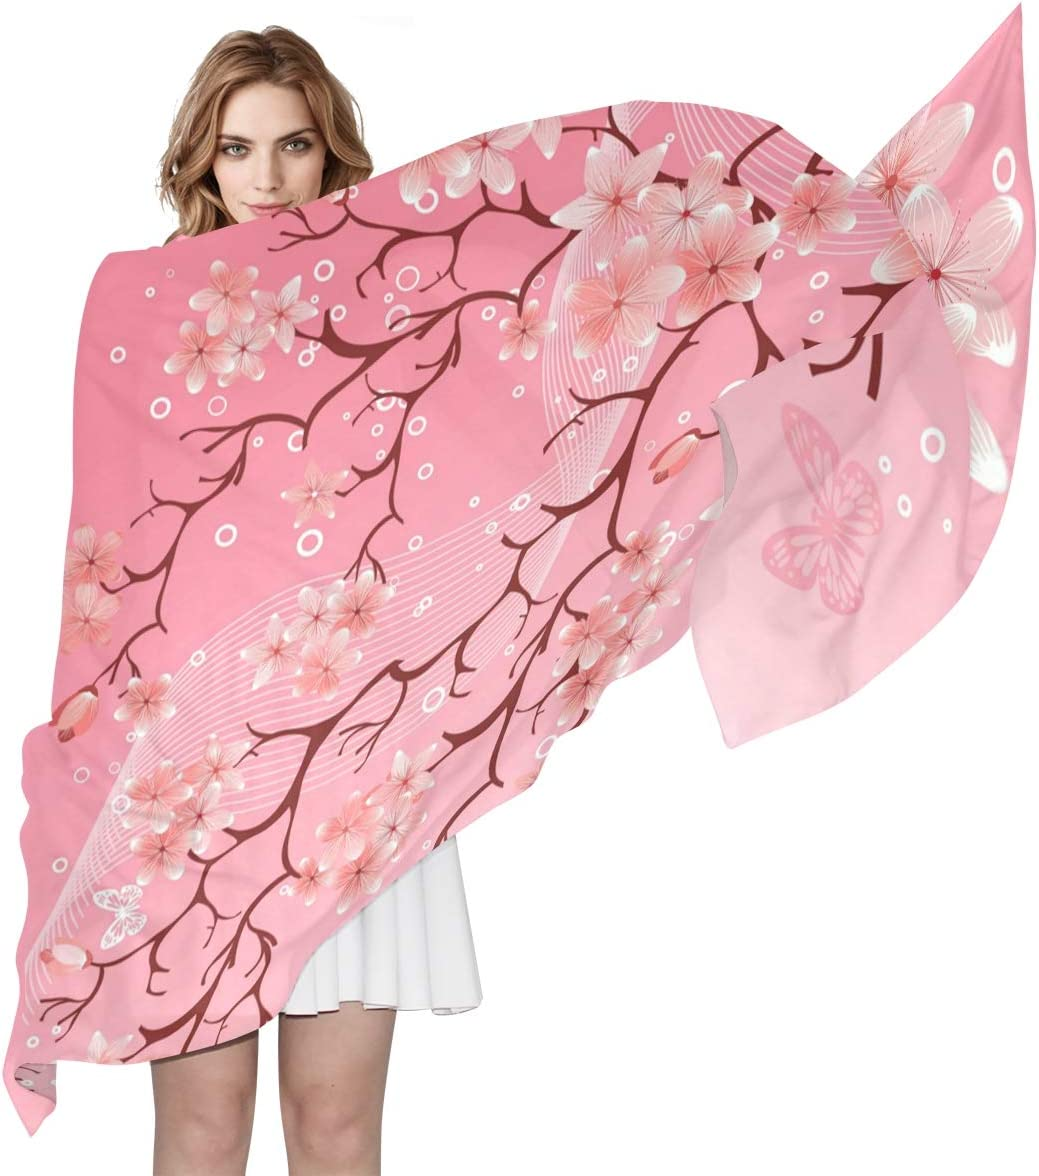 AUUXVA Fashion Scarf Floral Flower Japanese Cherry Blossom Long Lightweight Sunscreen Scarf Shawl Wrap Muffler Neckerchief for Women Men